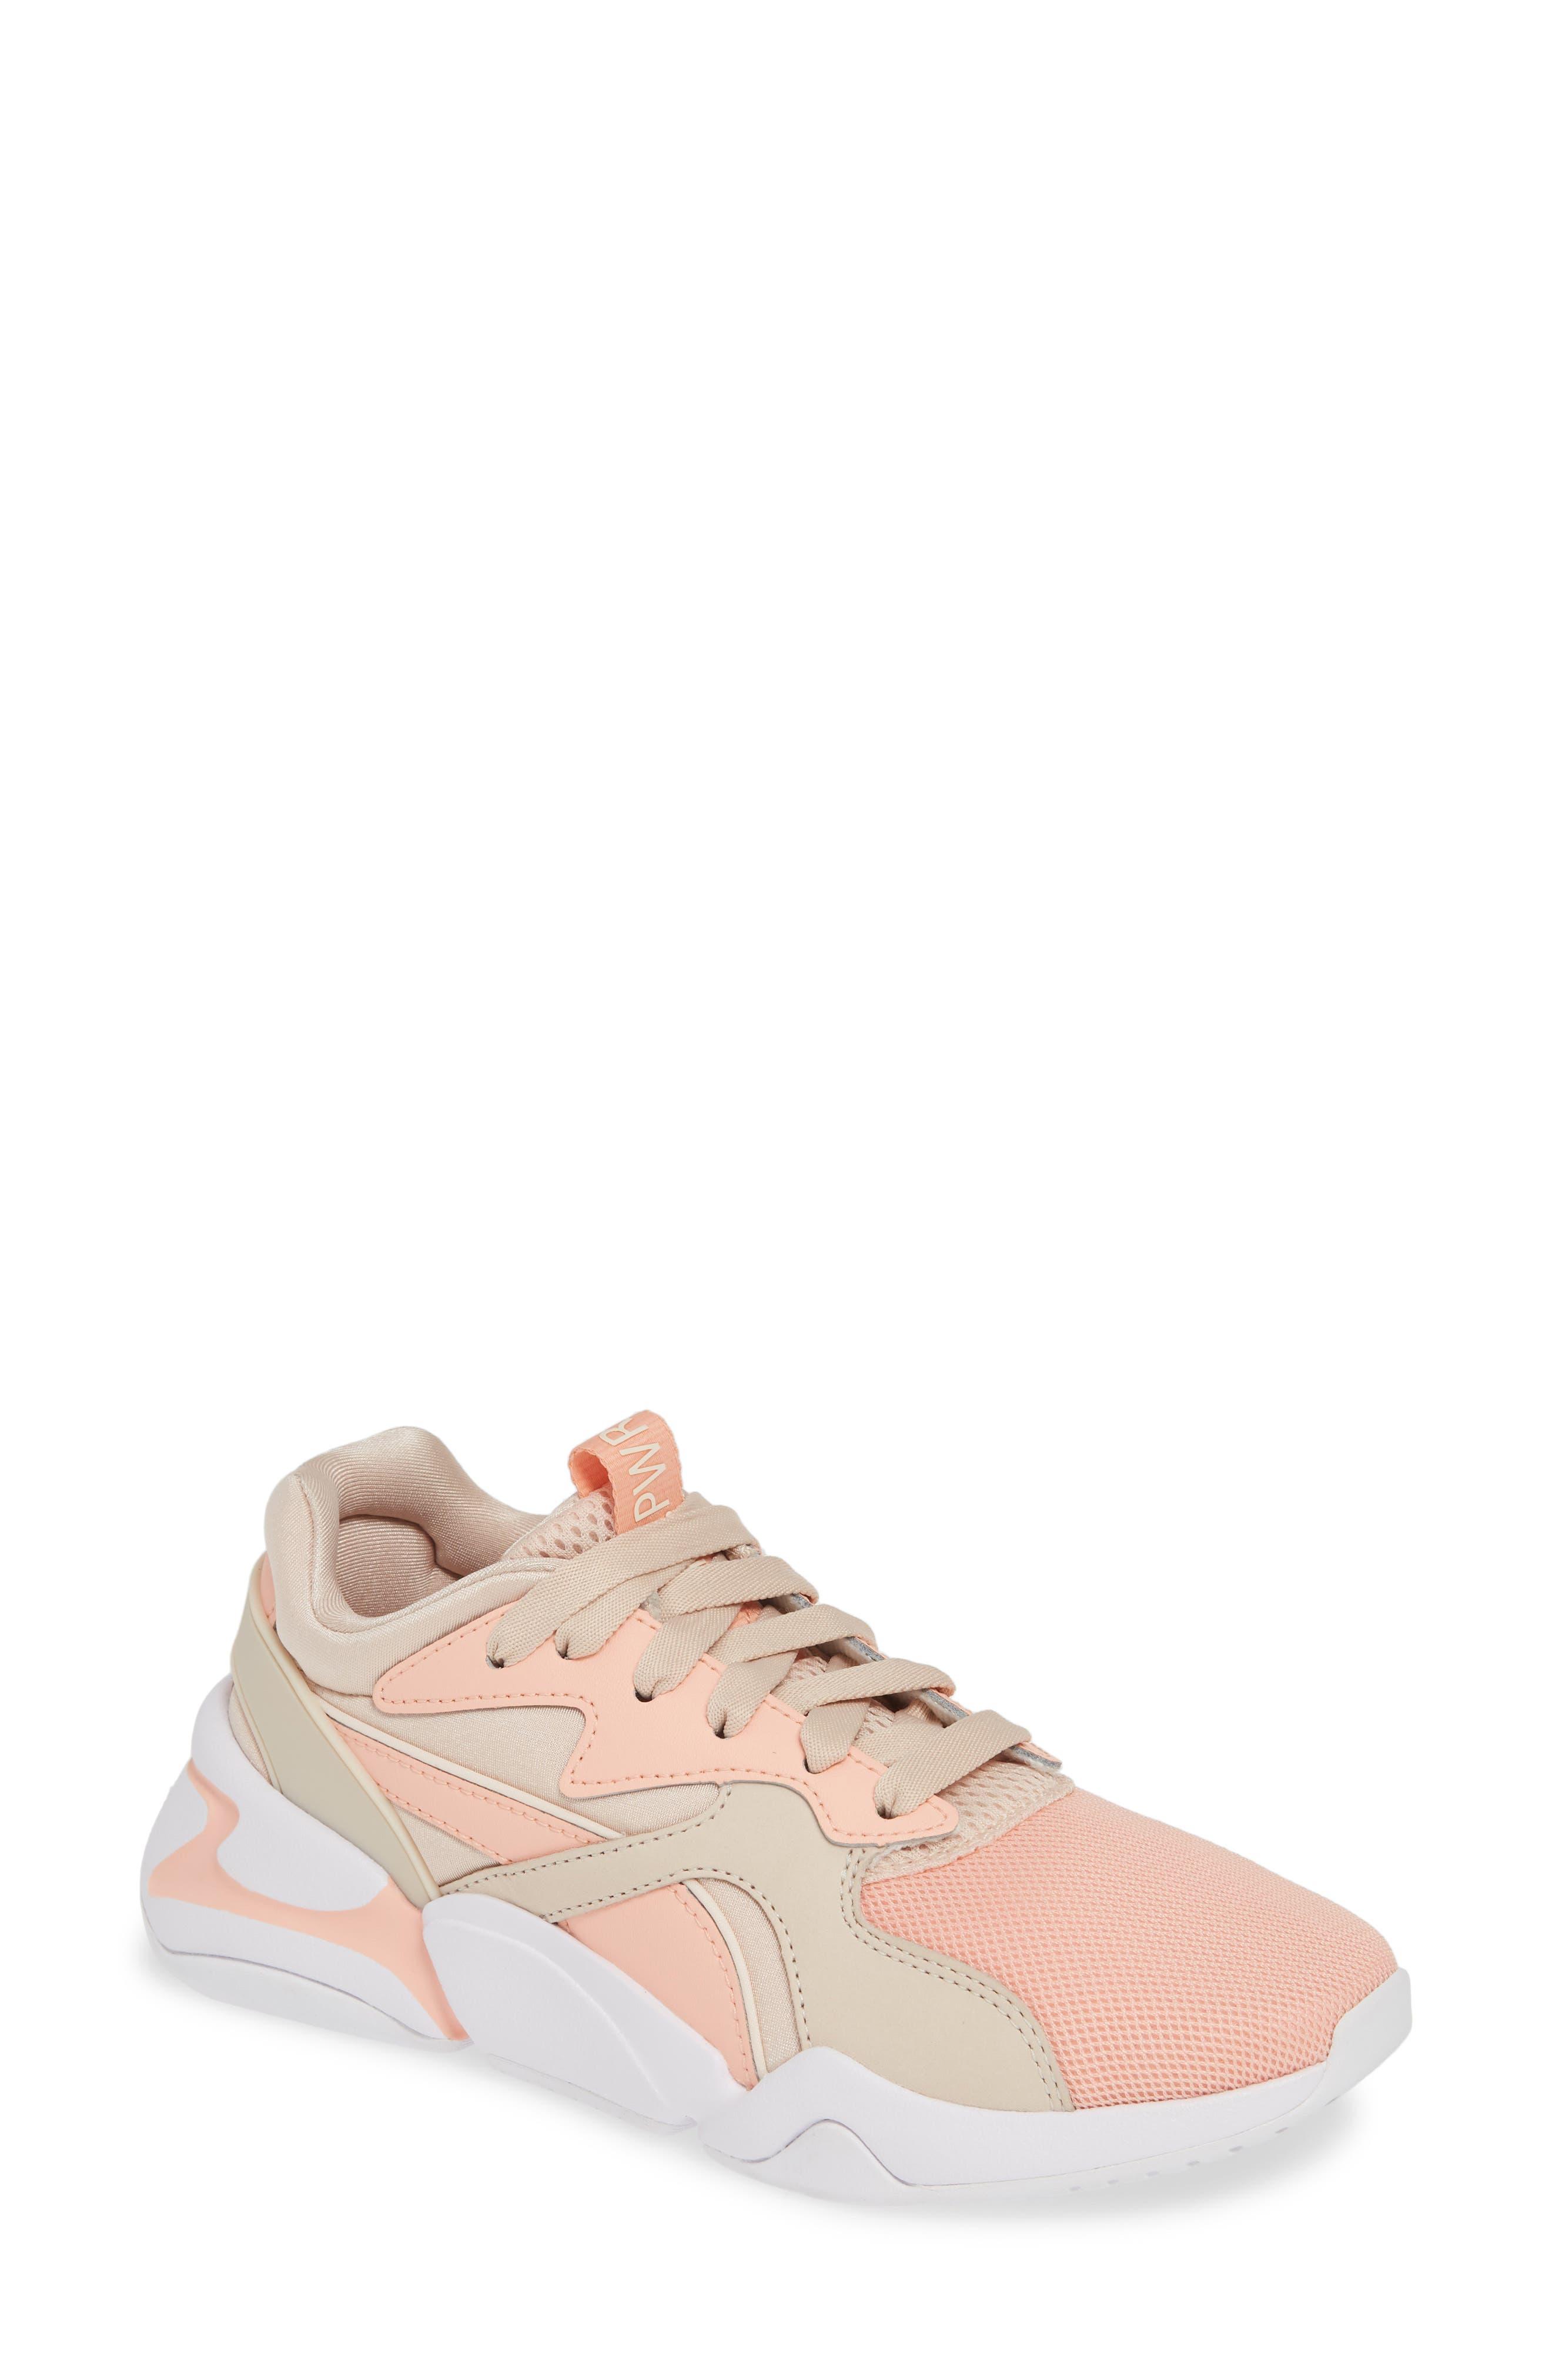 PUMA Nova GRL PWR Sneaker, Main, color, PEACH BUD/ PEARL BLUSH